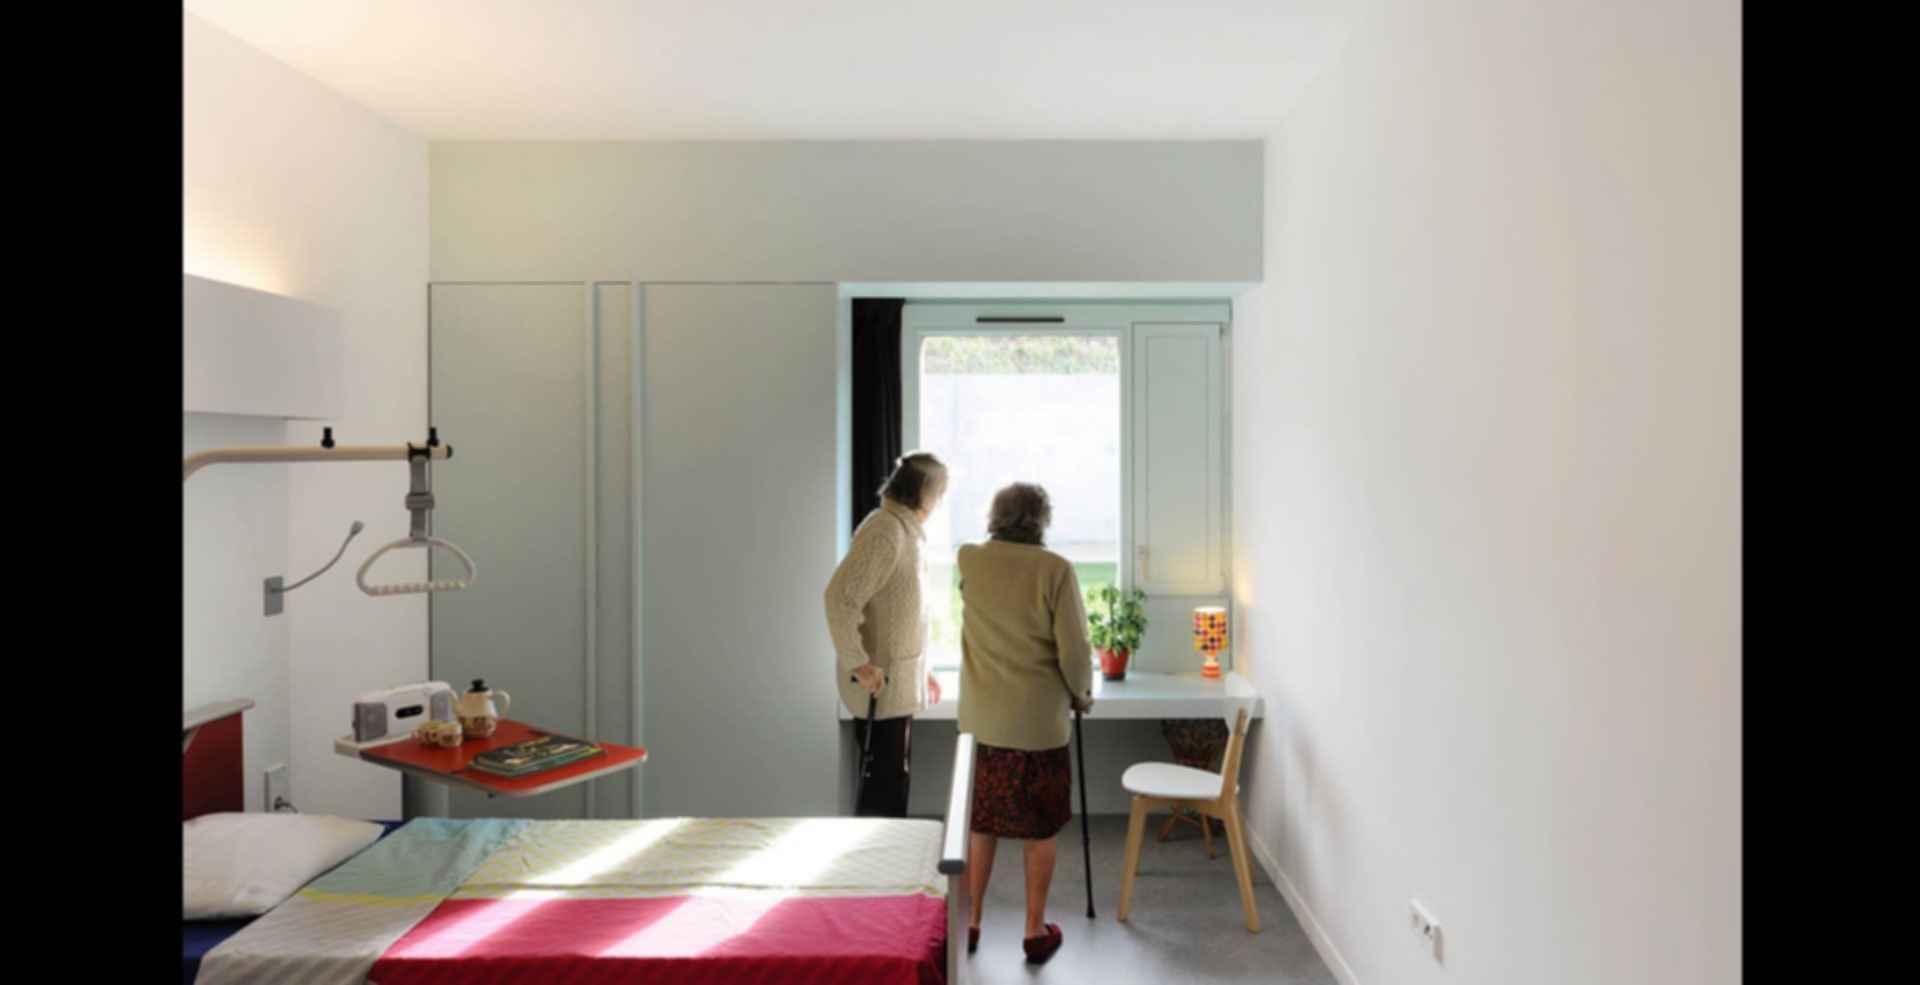 92-Bed Nursing Home - interior/bedroom